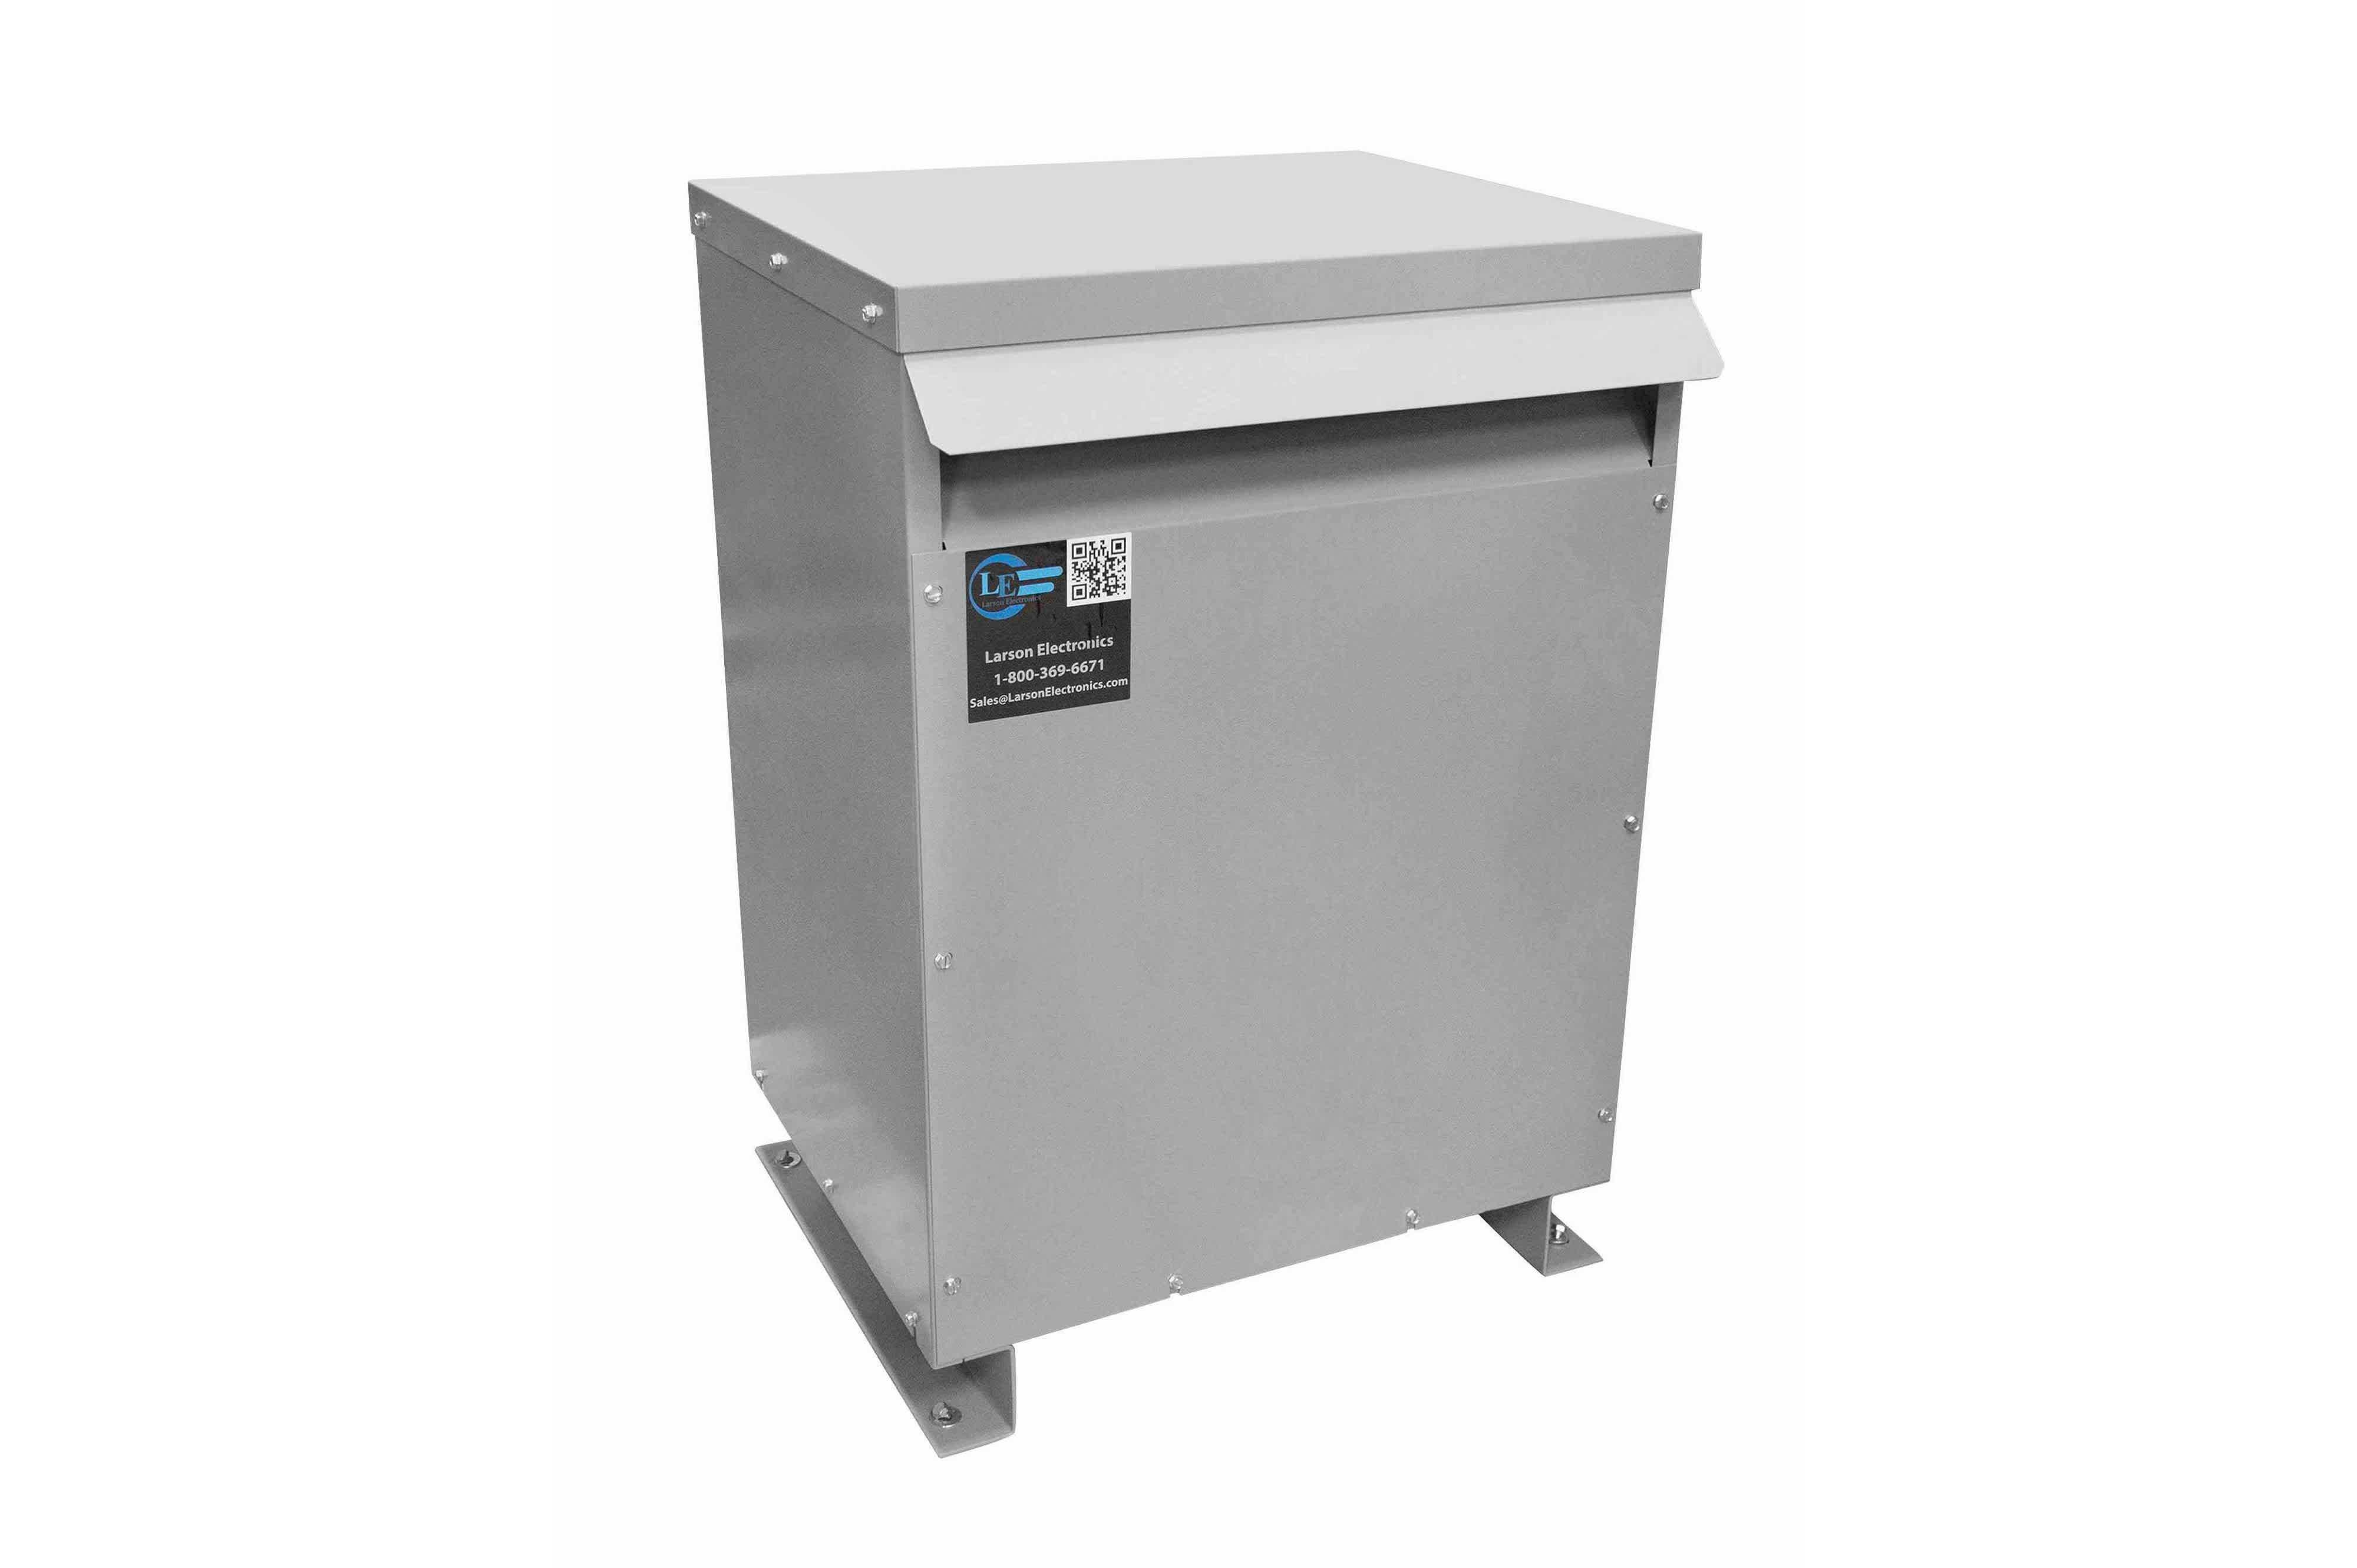 900 kVA 3PH Isolation Transformer, 208V Wye Primary, 415Y/240 Wye-N Secondary, N3R, Ventilated, 60 Hz